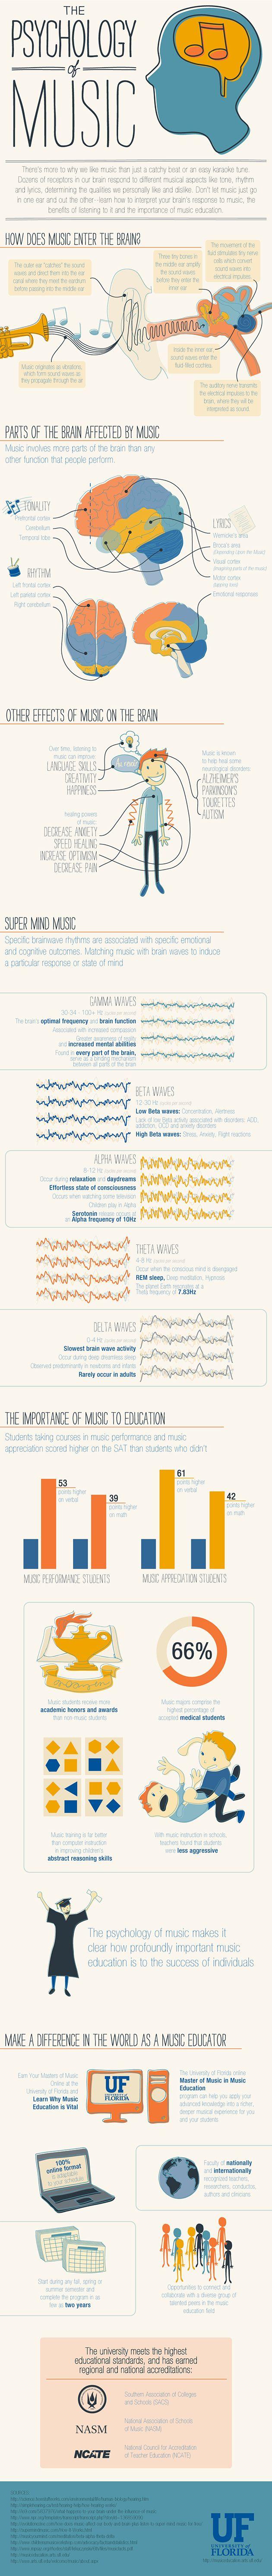 Psychology of Music.